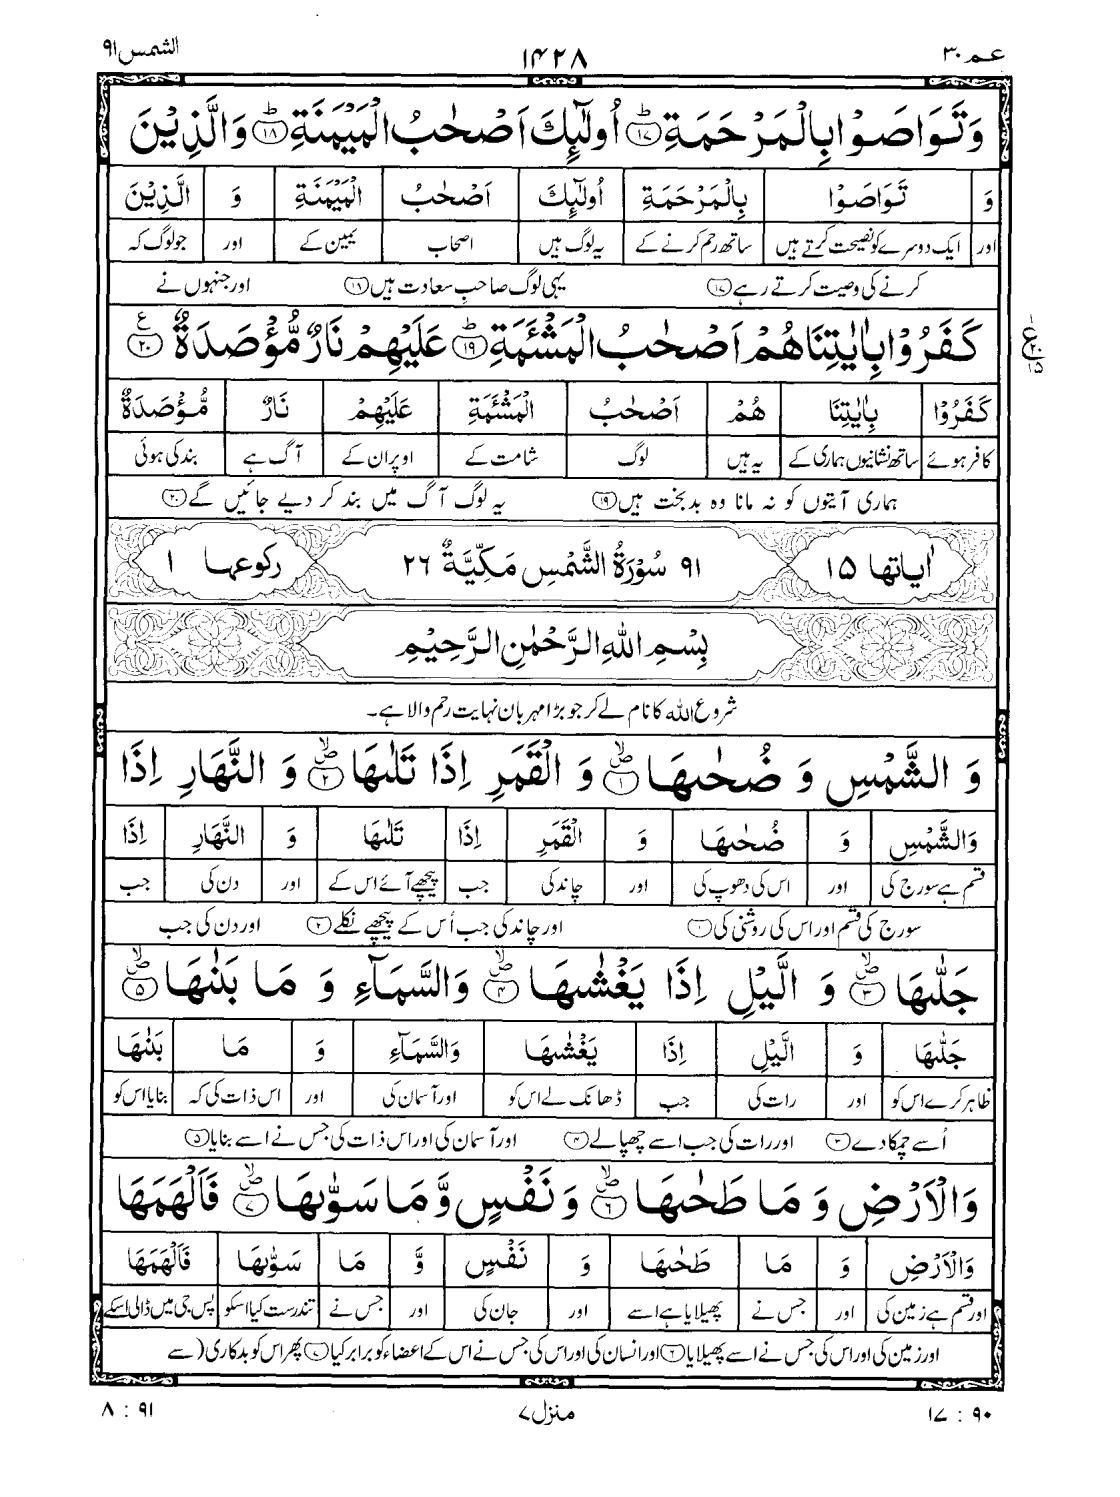 Quran Surah 91 الشمس Ash Shams Urdu Translation Tarjuma Word To Word لفظی معنی Pdf By Daaiyat Ul Islam Issuu